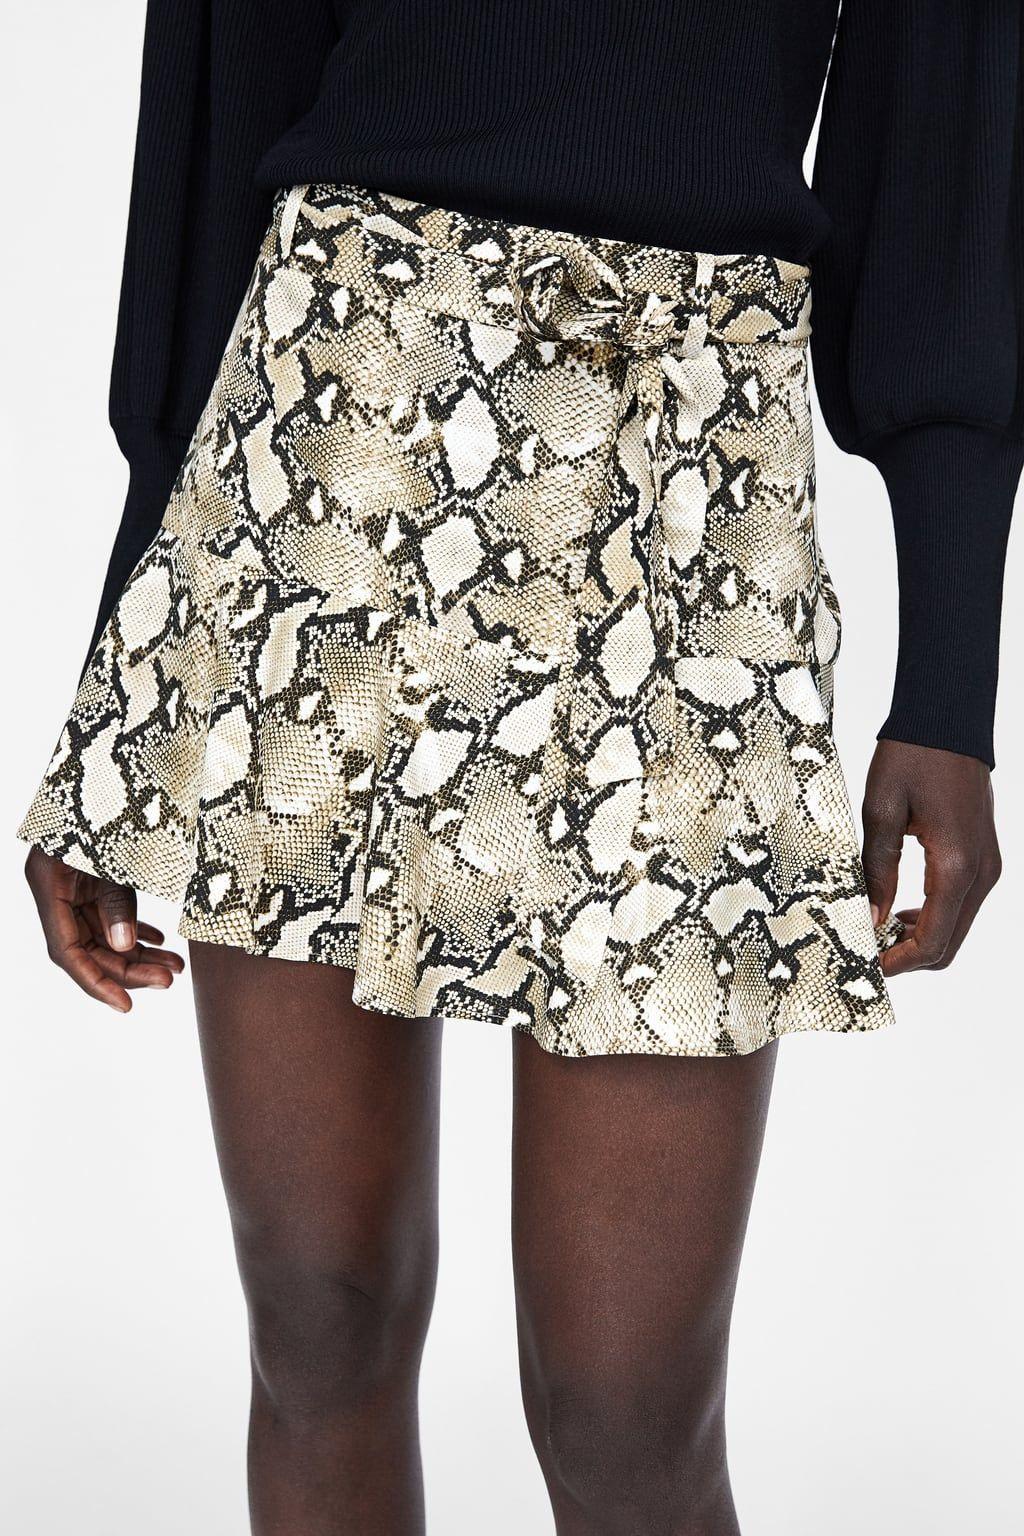 ad543ff429 Animal print bermuda shorts in 2019   anita's wishlist   Printed ...